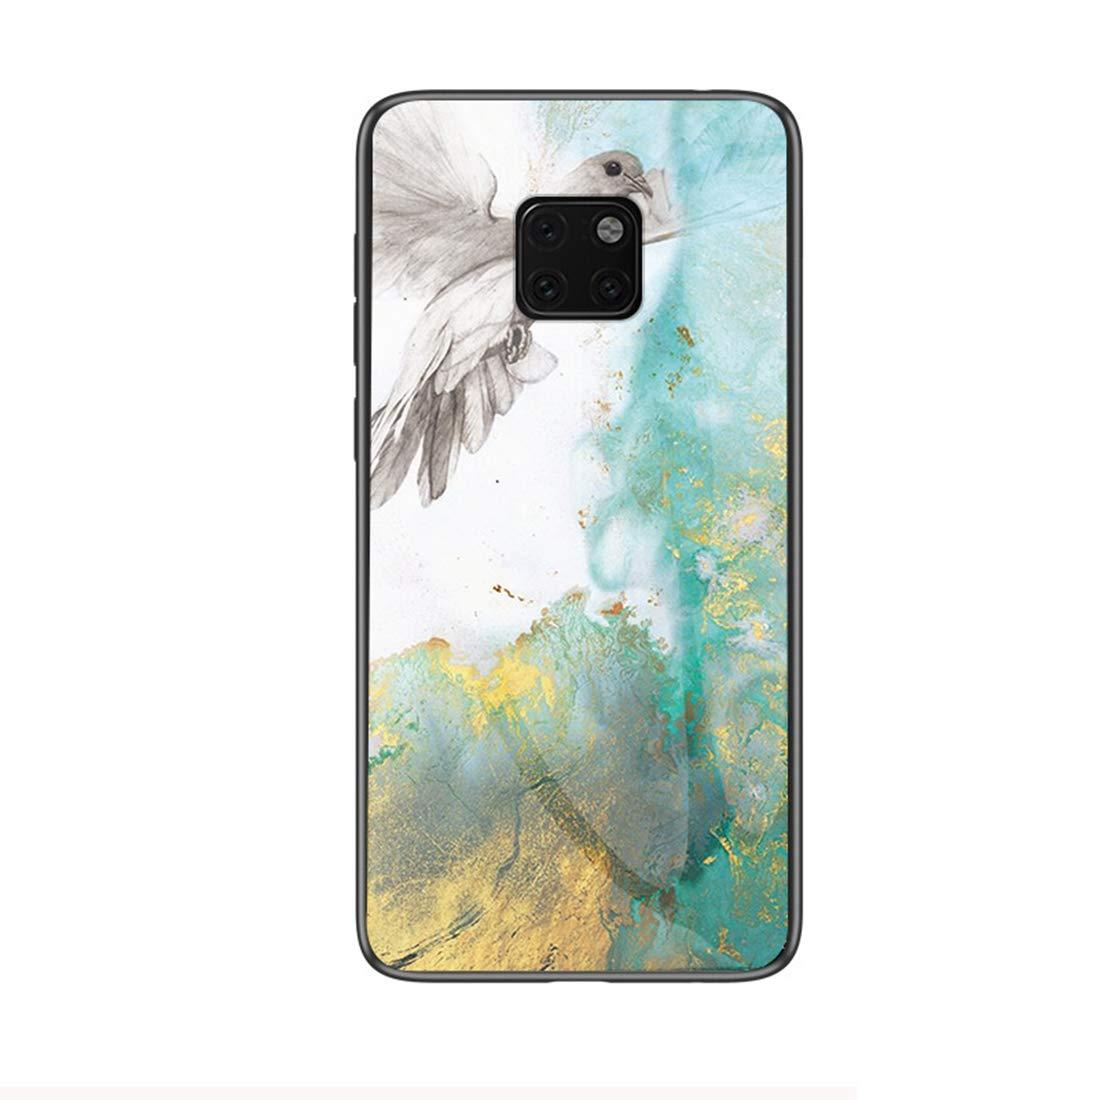 Felfy Kompatibel mit Huawei Mate 20 Pro H/ülle Rot,Kompatibel mit Huawei Mate 20 Pro Handyh/ülle Geh/ärtetes Glas Back Case Marmor Muster Schutzh/ülle TPU Silikon /& Glas Hart Case Kratzfest Cover